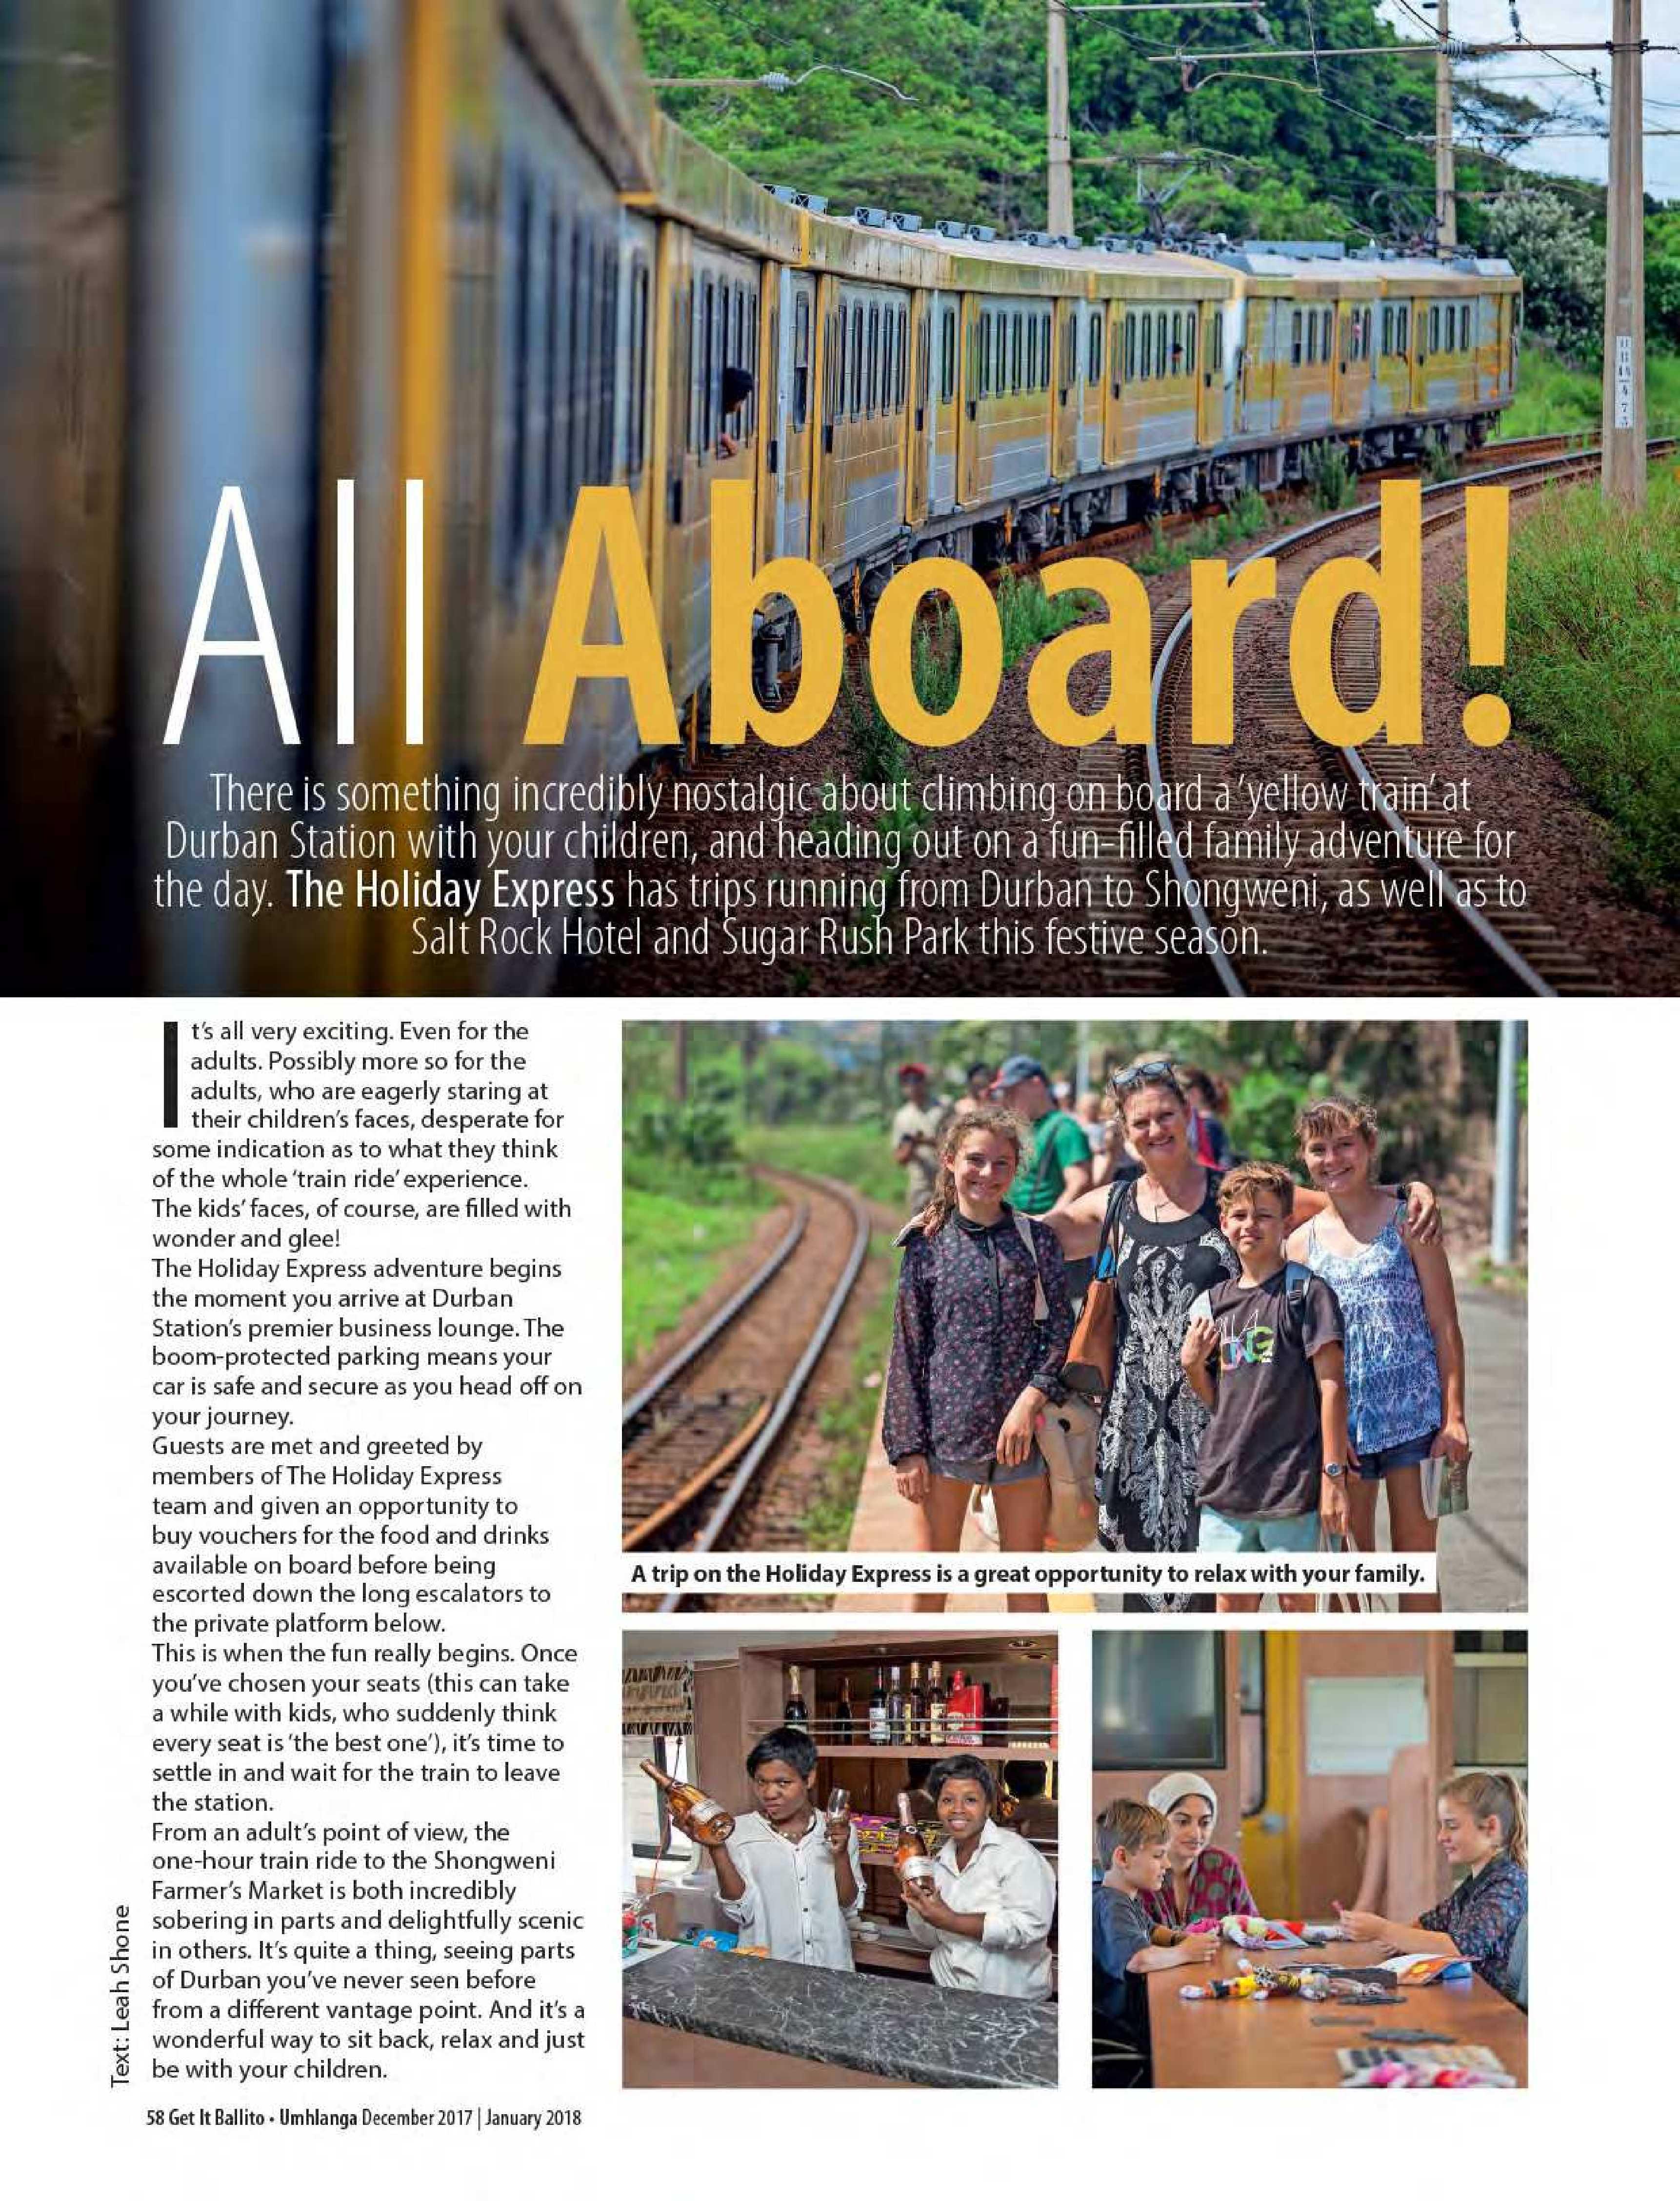 get-magazine-ballitoumhlanga-december-2017-january-2018-2-epapers-page-60